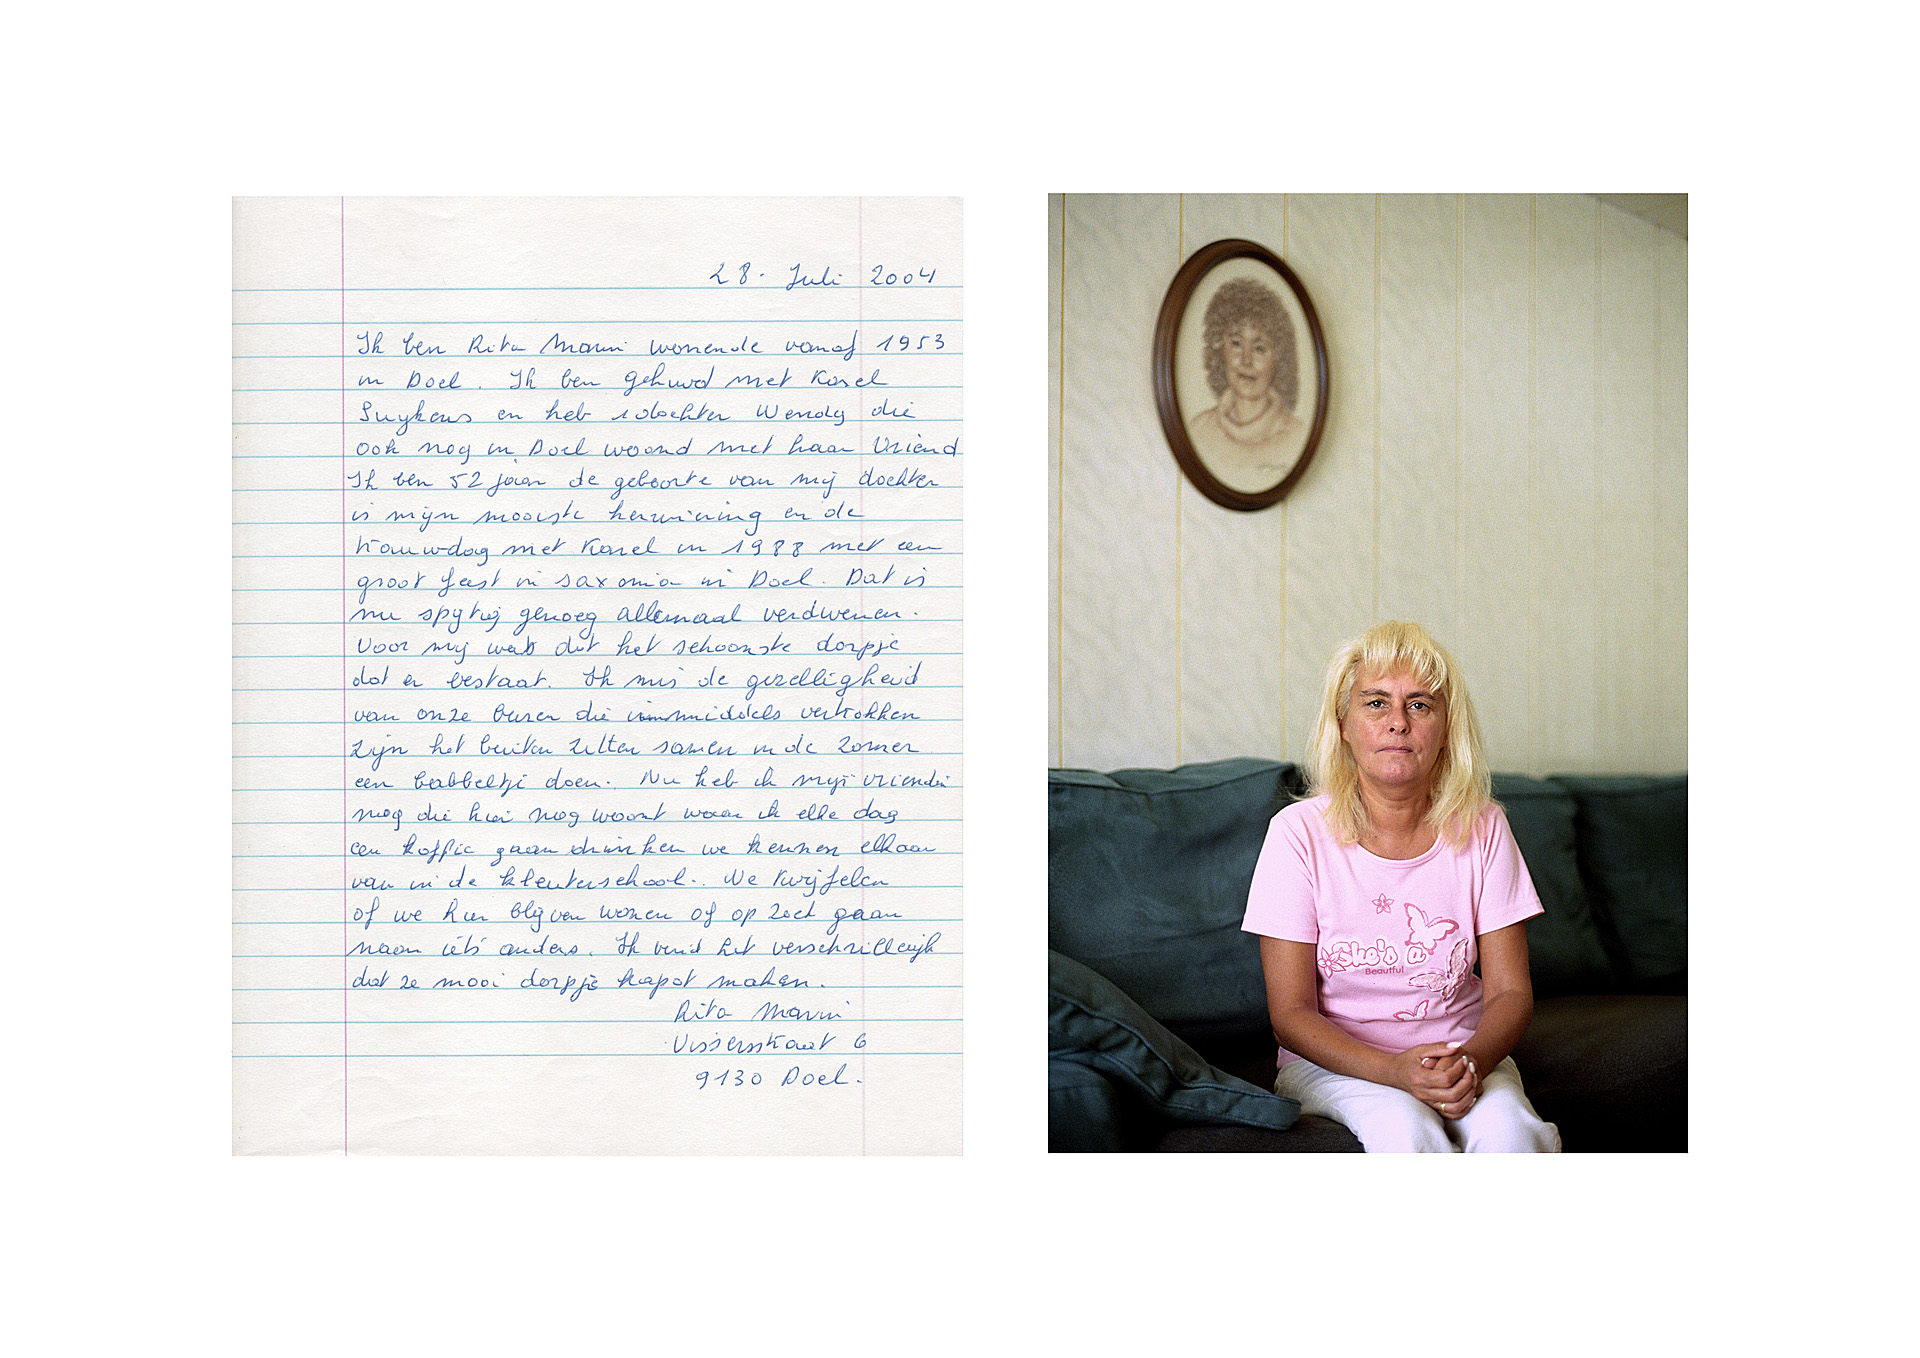 Testimony from Doel - Els Matthysen